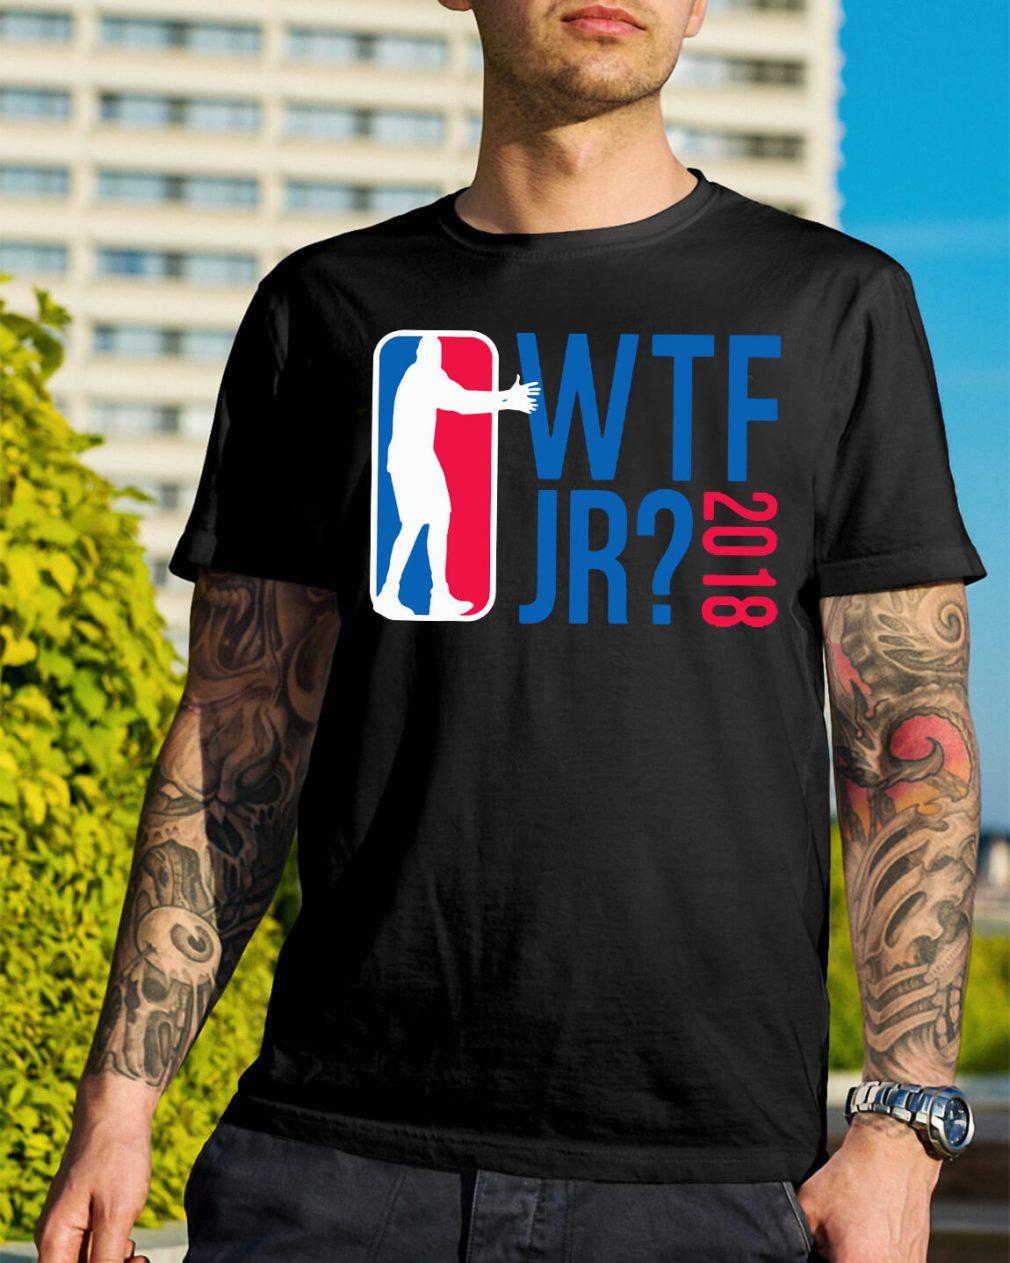 Basketball WTF JR 2018 shirt